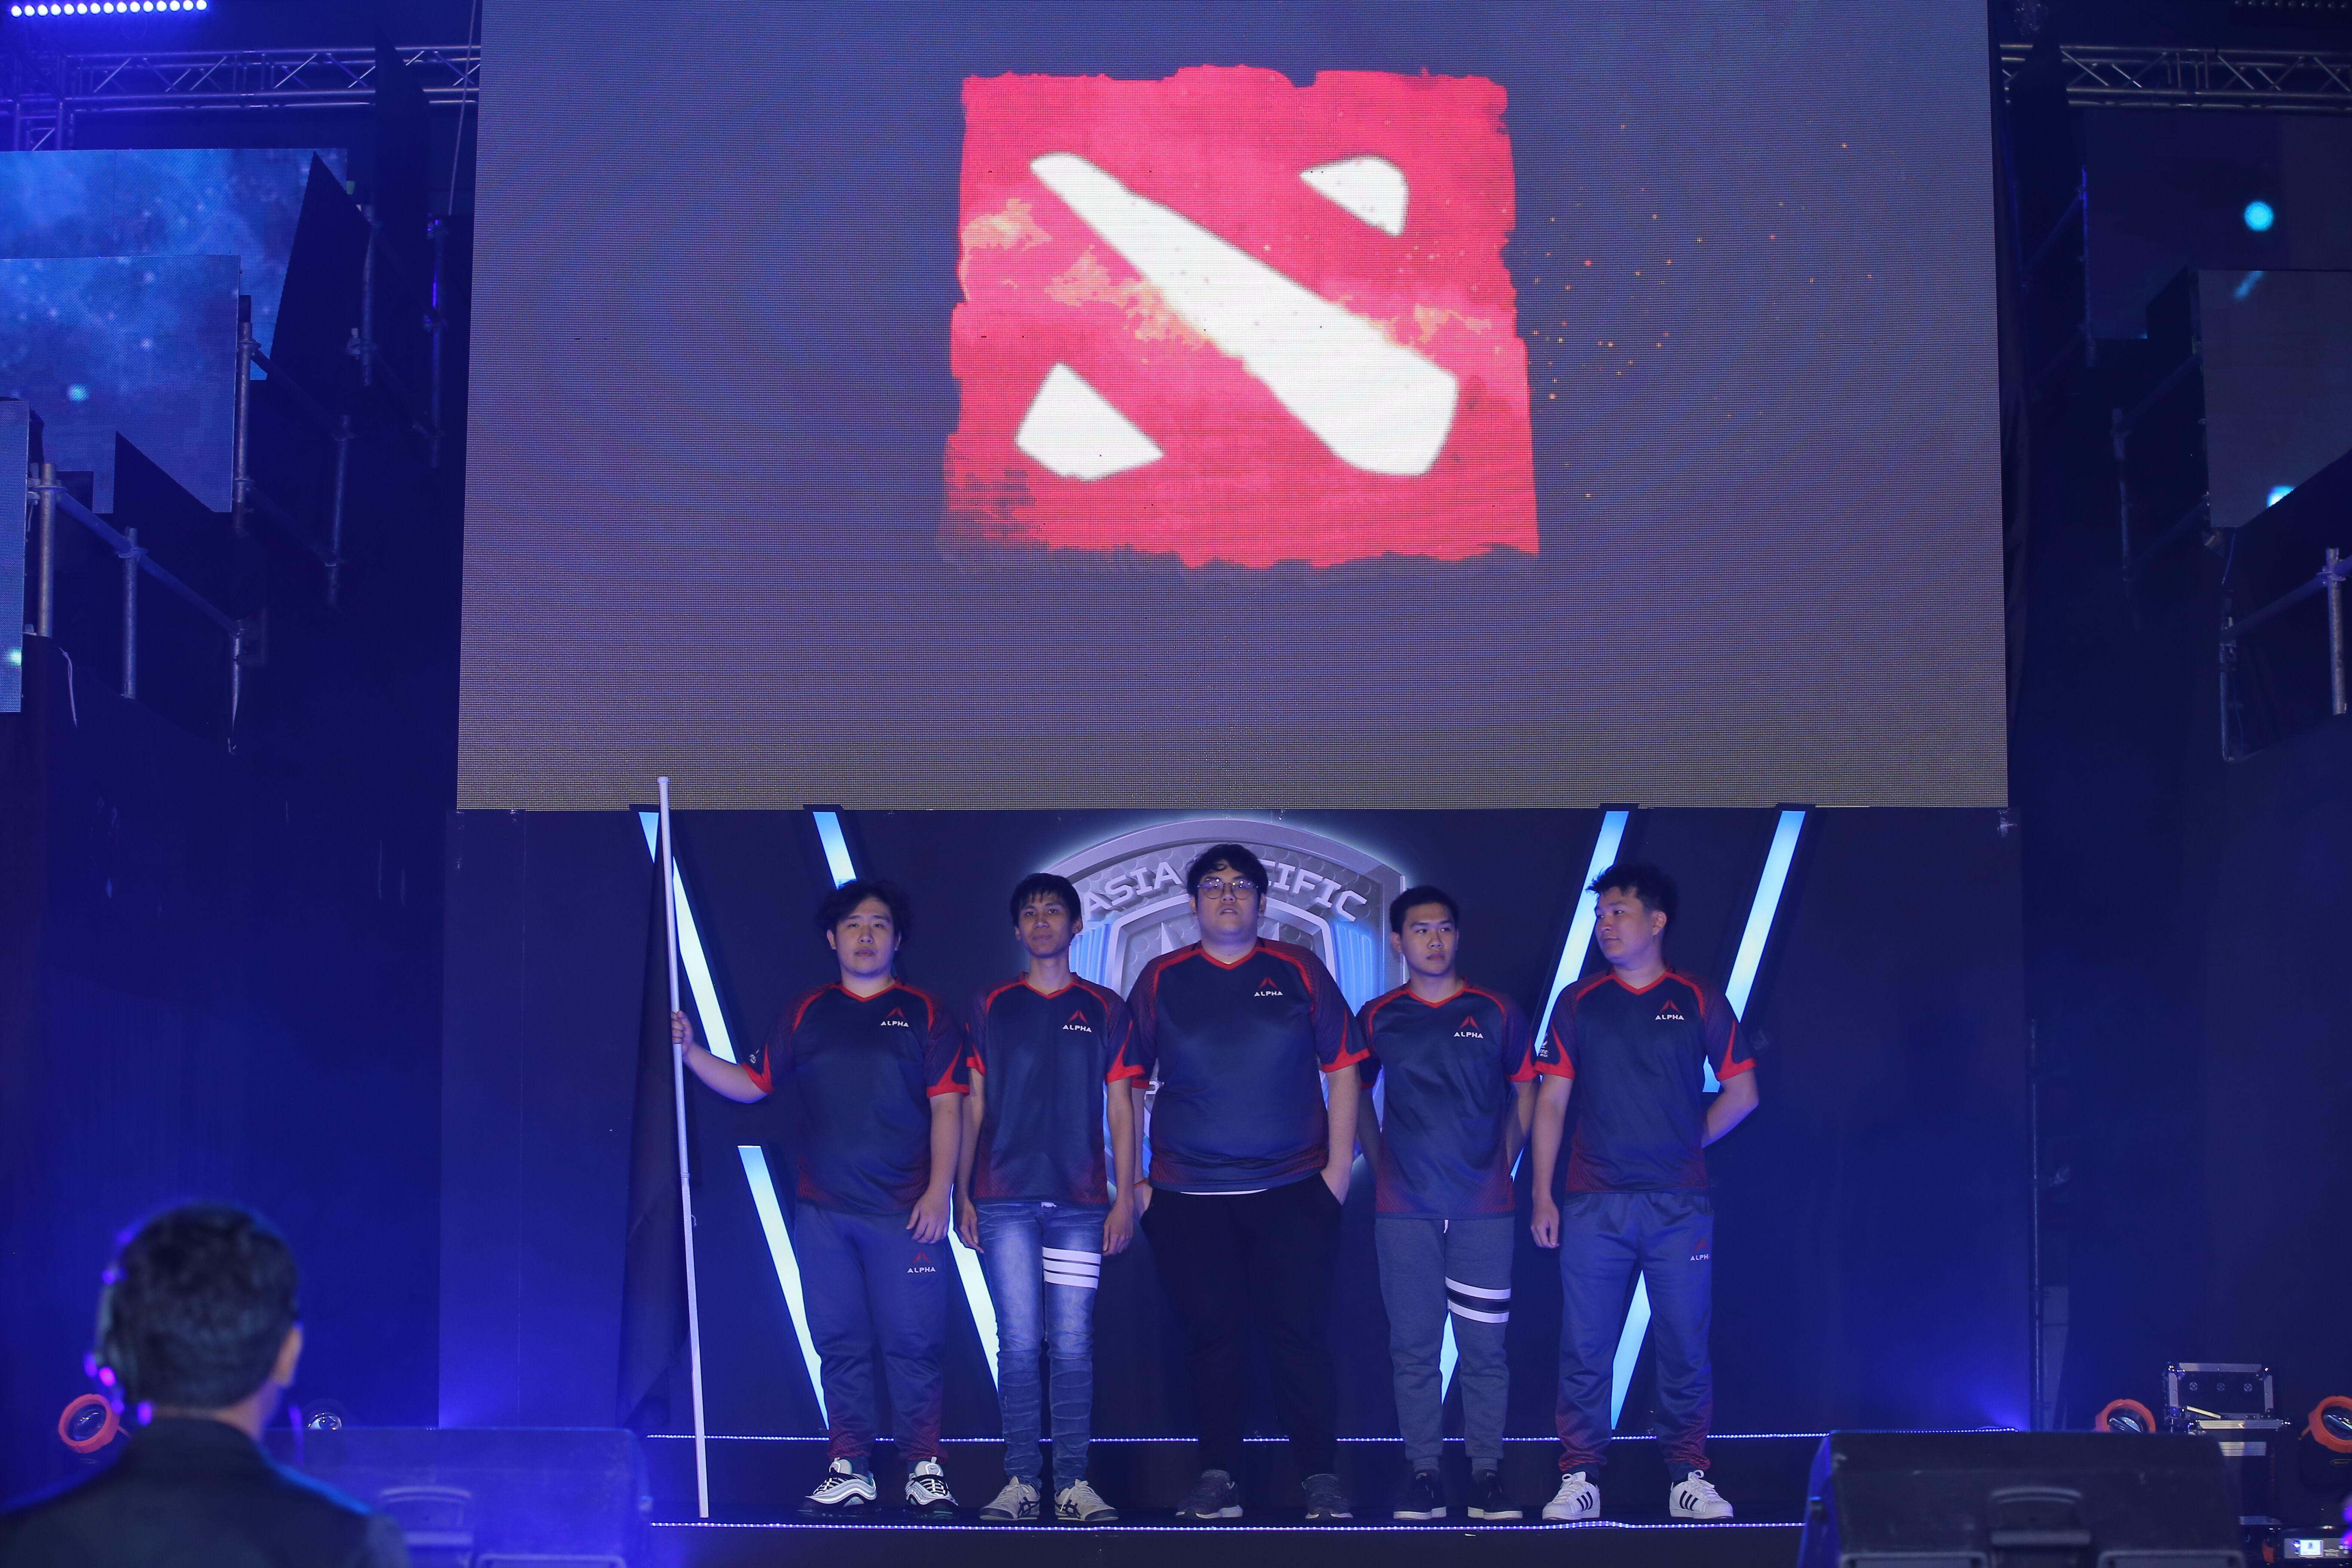 kda0xrf  jpeg บรรยากาศงาน Asia Pacific Predator League 2019 สุดยอดขุนพลทีมอีสปอร์ตเข้าร่วมการแข่งขันรอบแกรนด์ไฟนอล